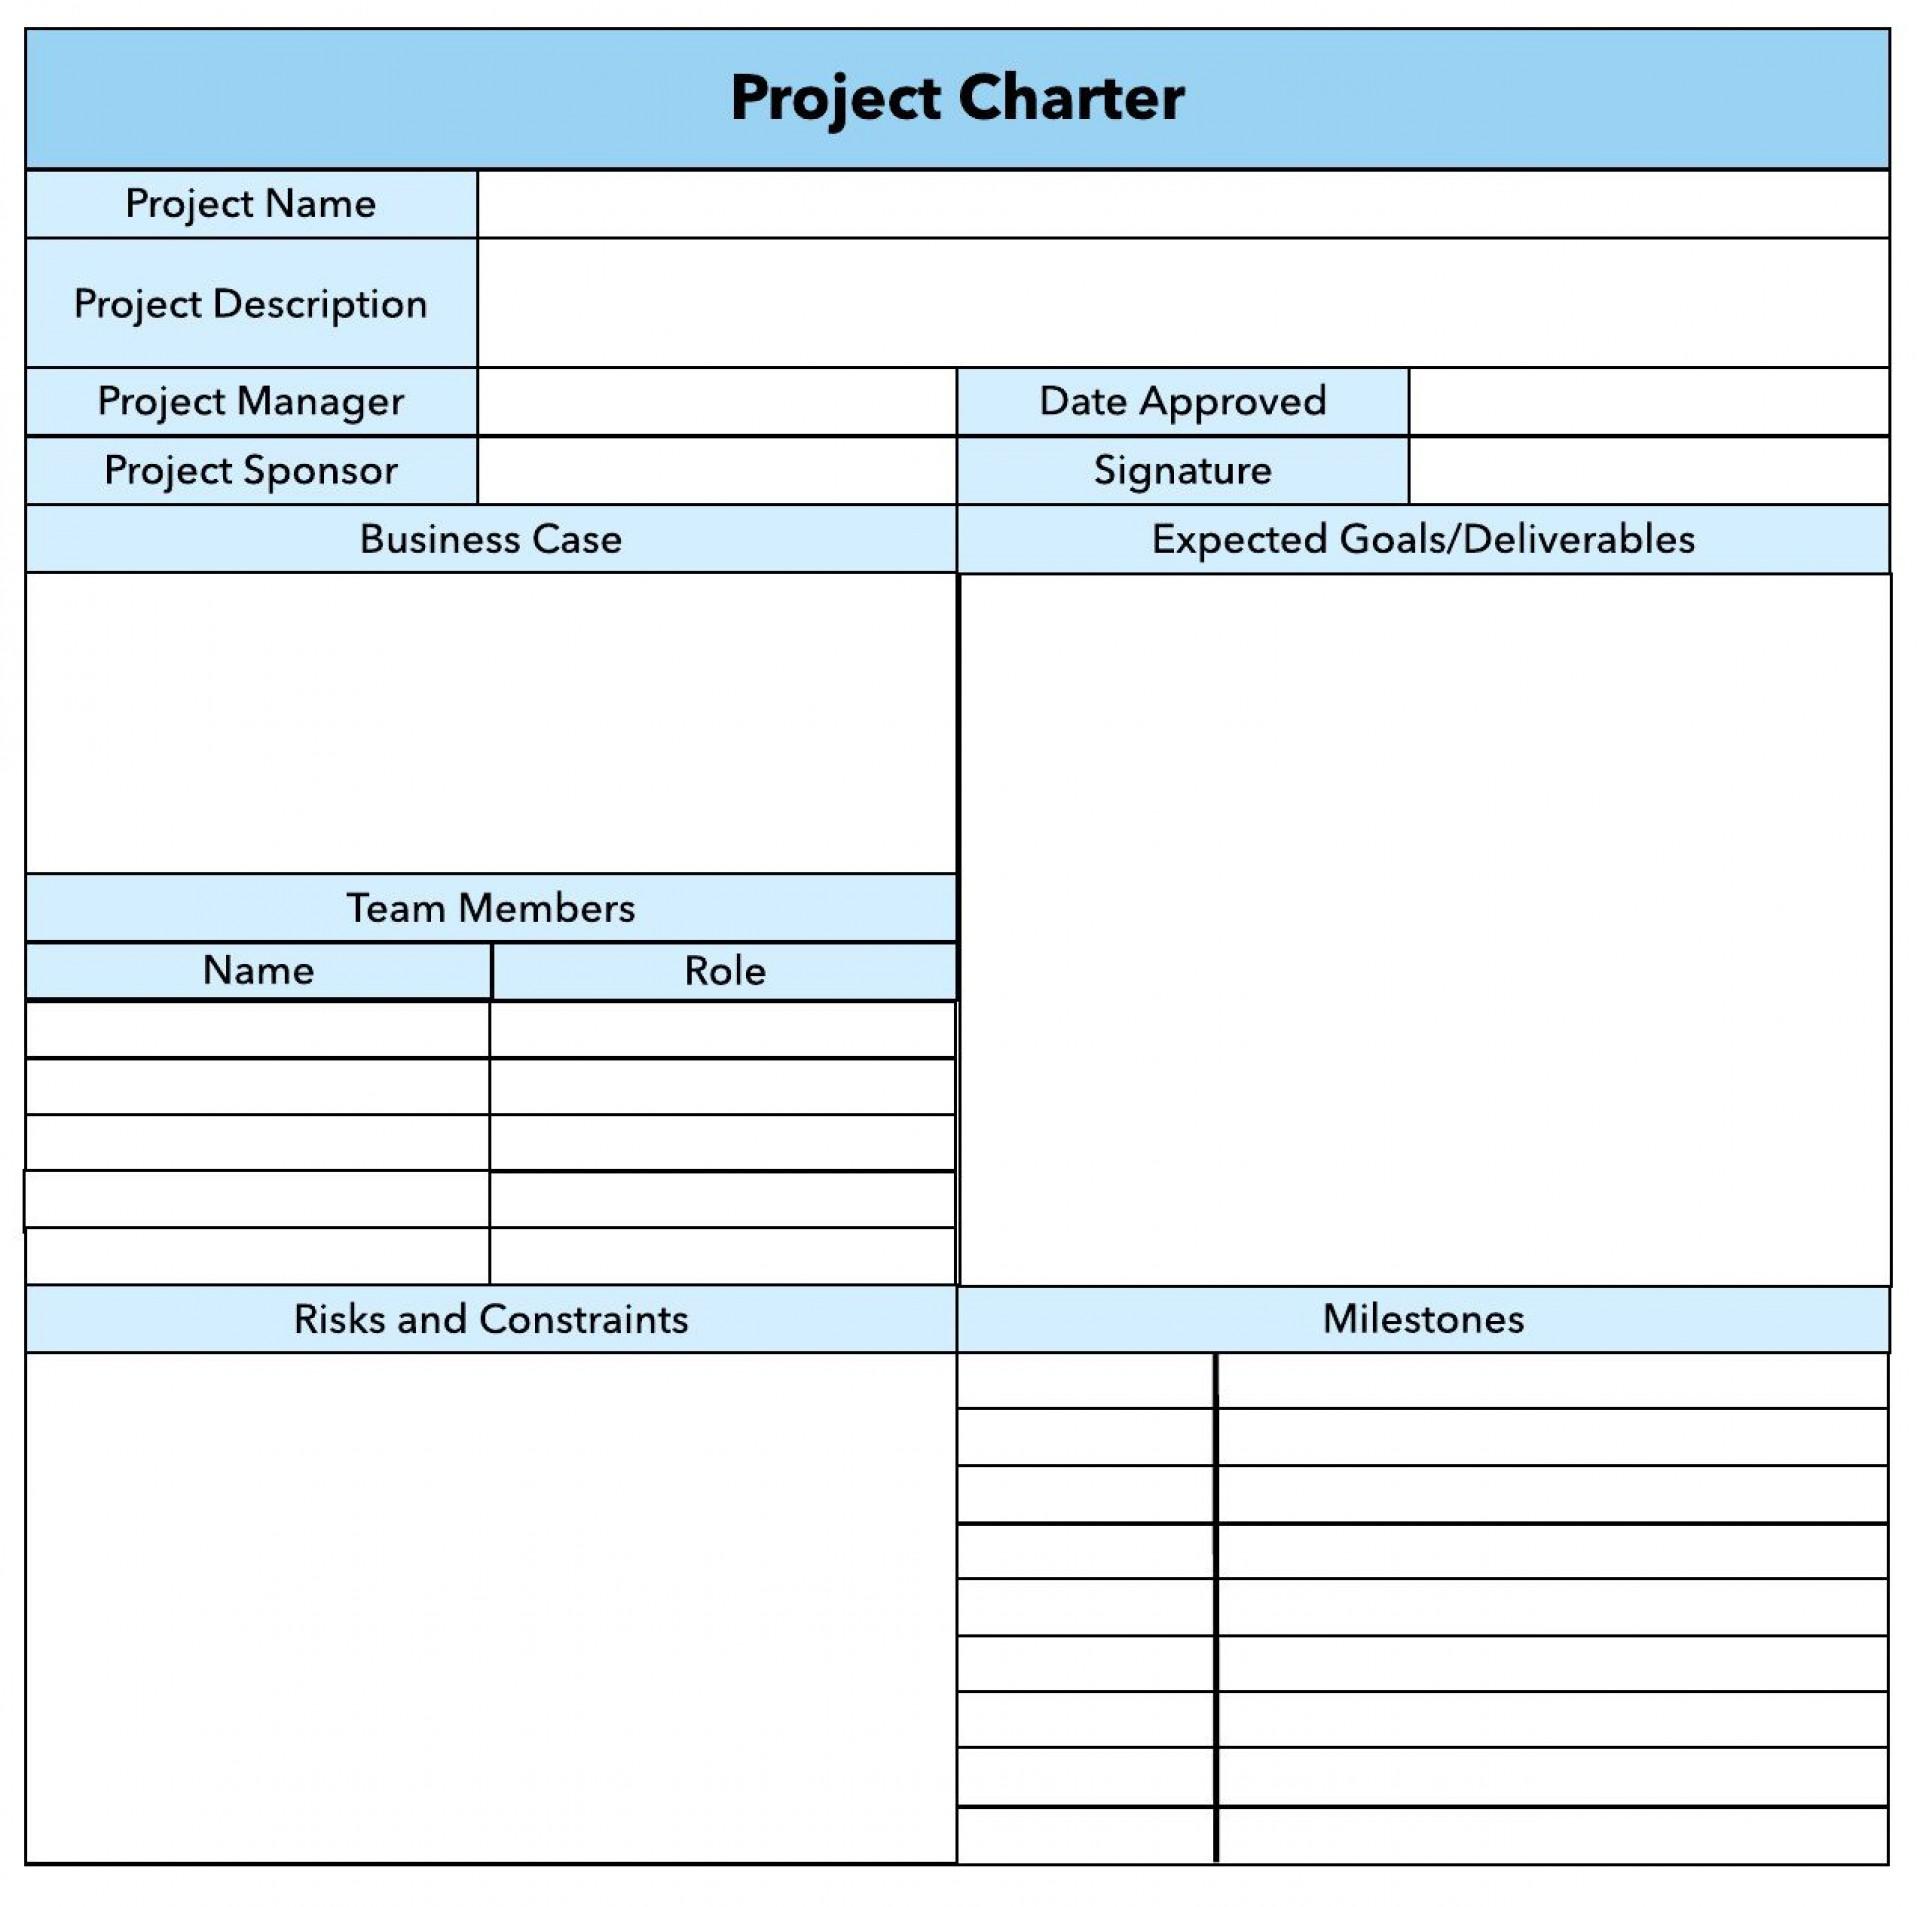 007 Unique Project Charter Template Excel Photo  Lean Pmbok Nederland1920